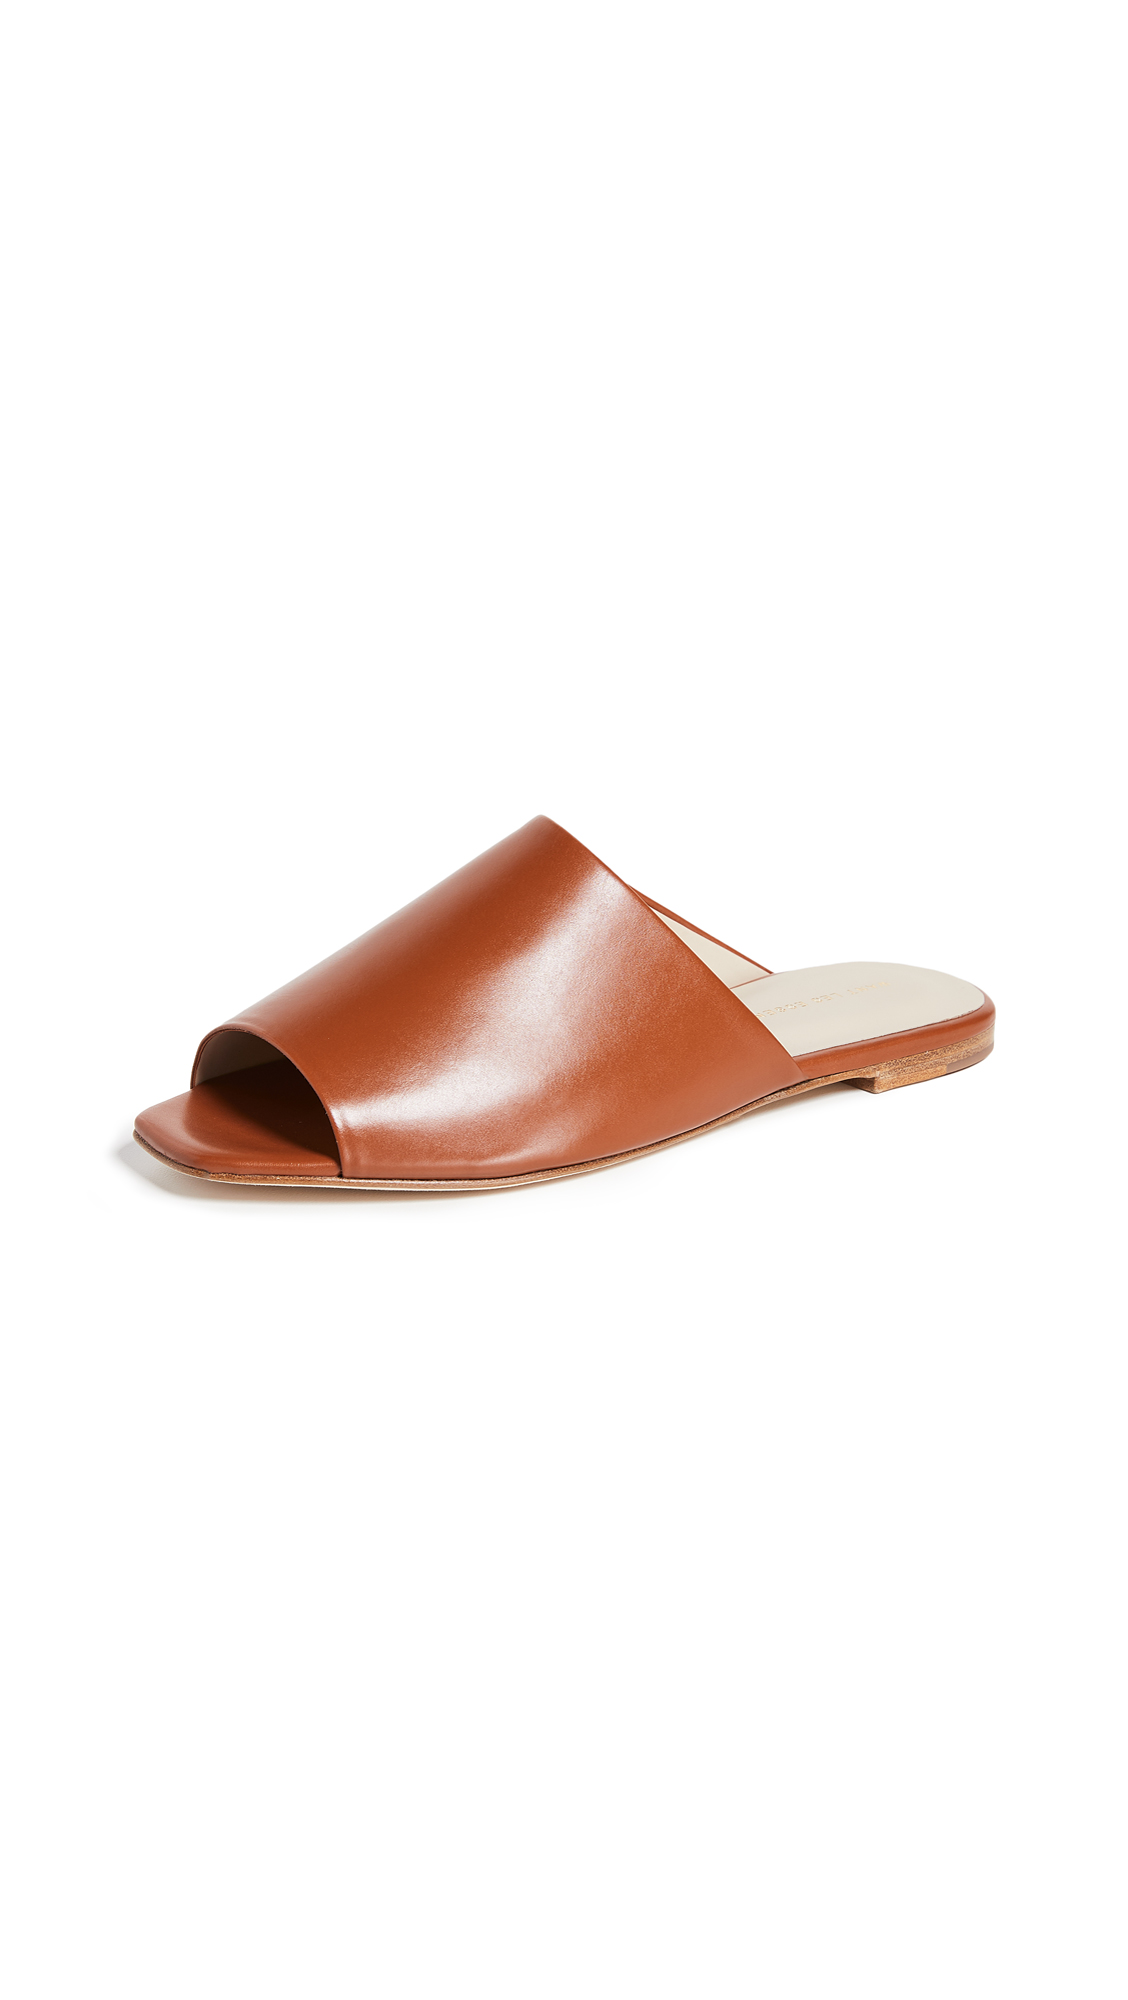 WANT Les Essentiels Sofia Slide Sandals - Amber